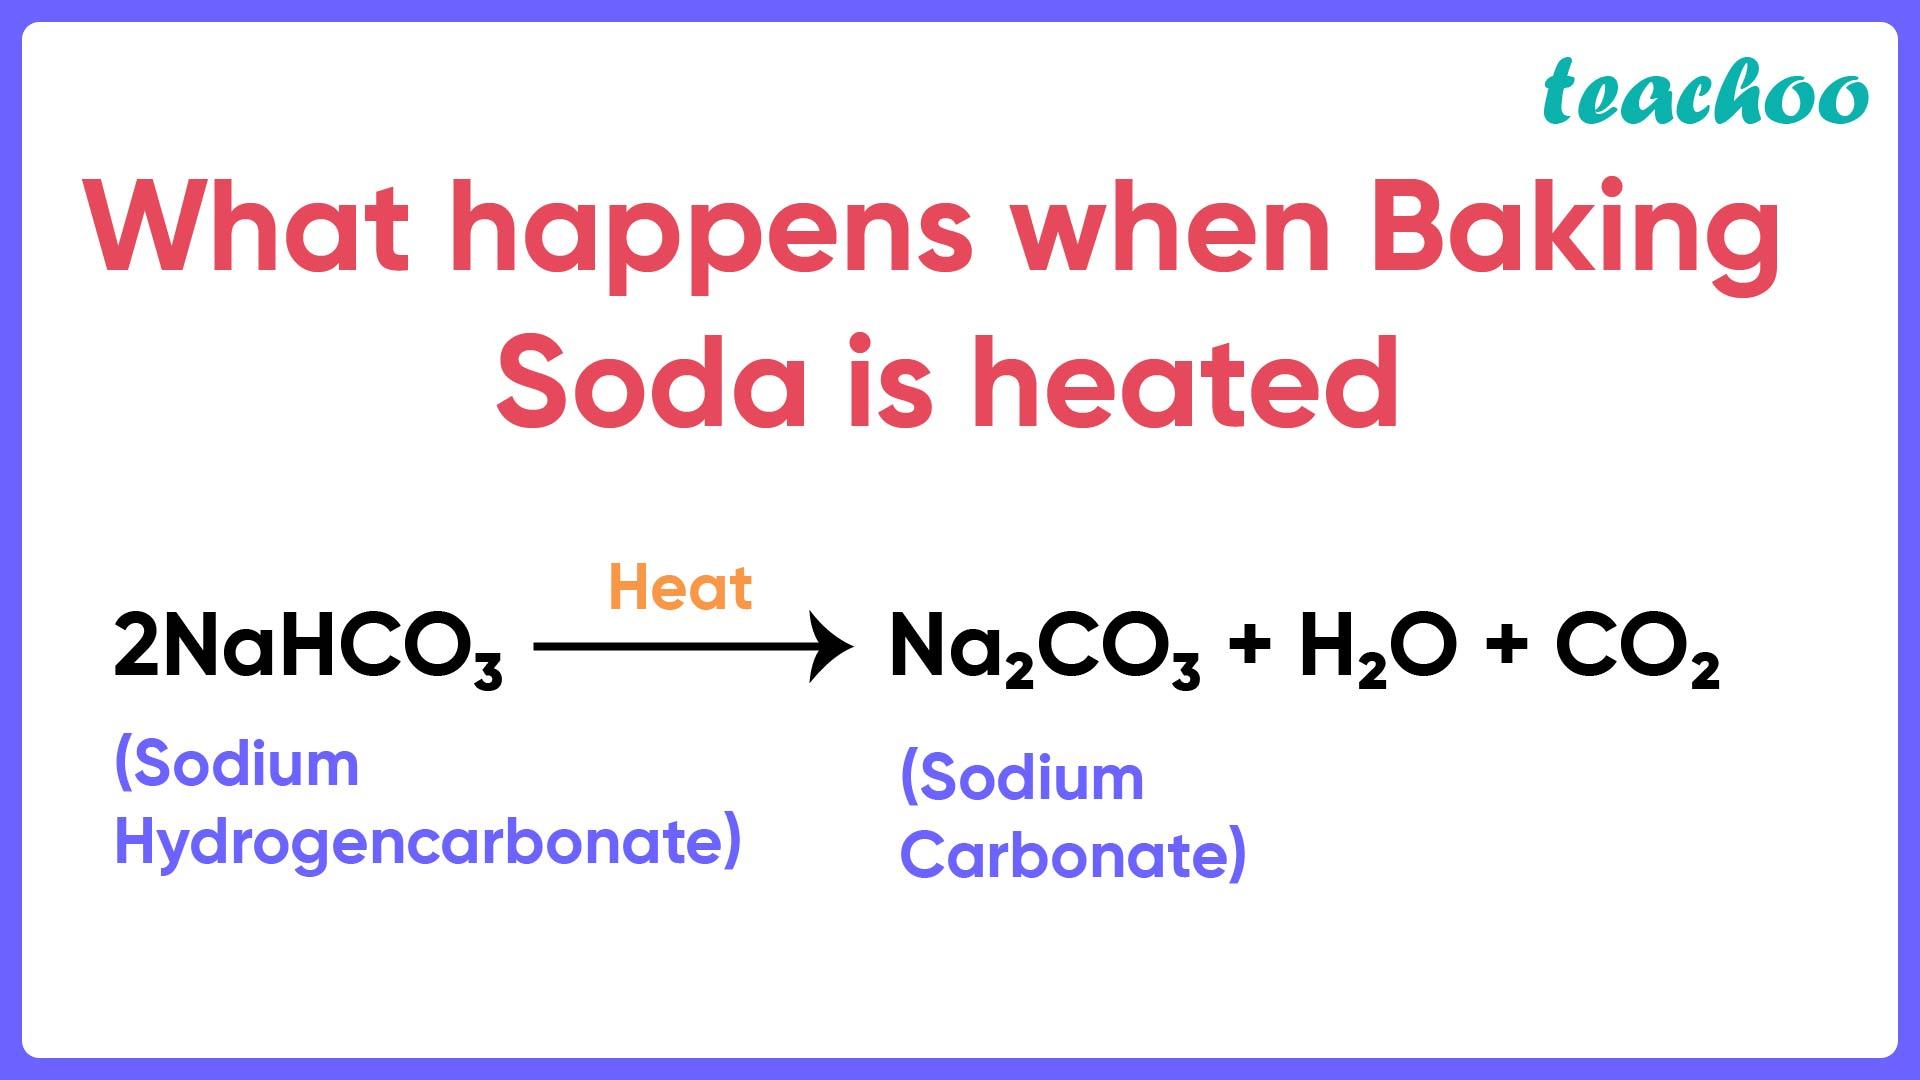 What happens when Baking Soda is heated - Teachoo-01.jpg